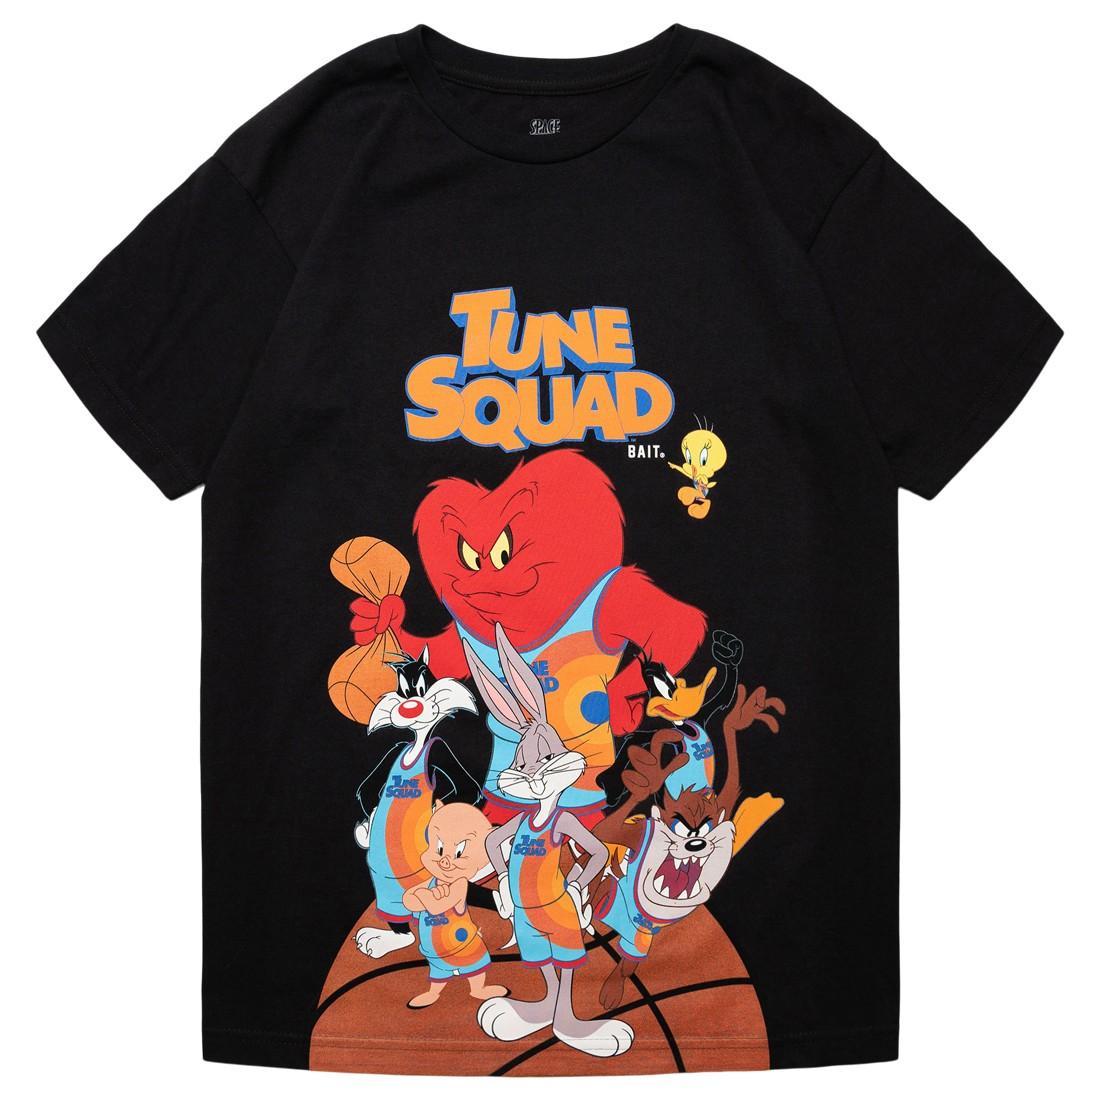 BAIT x Space Jam A New Legacy Men Tune Squad Tee (black)